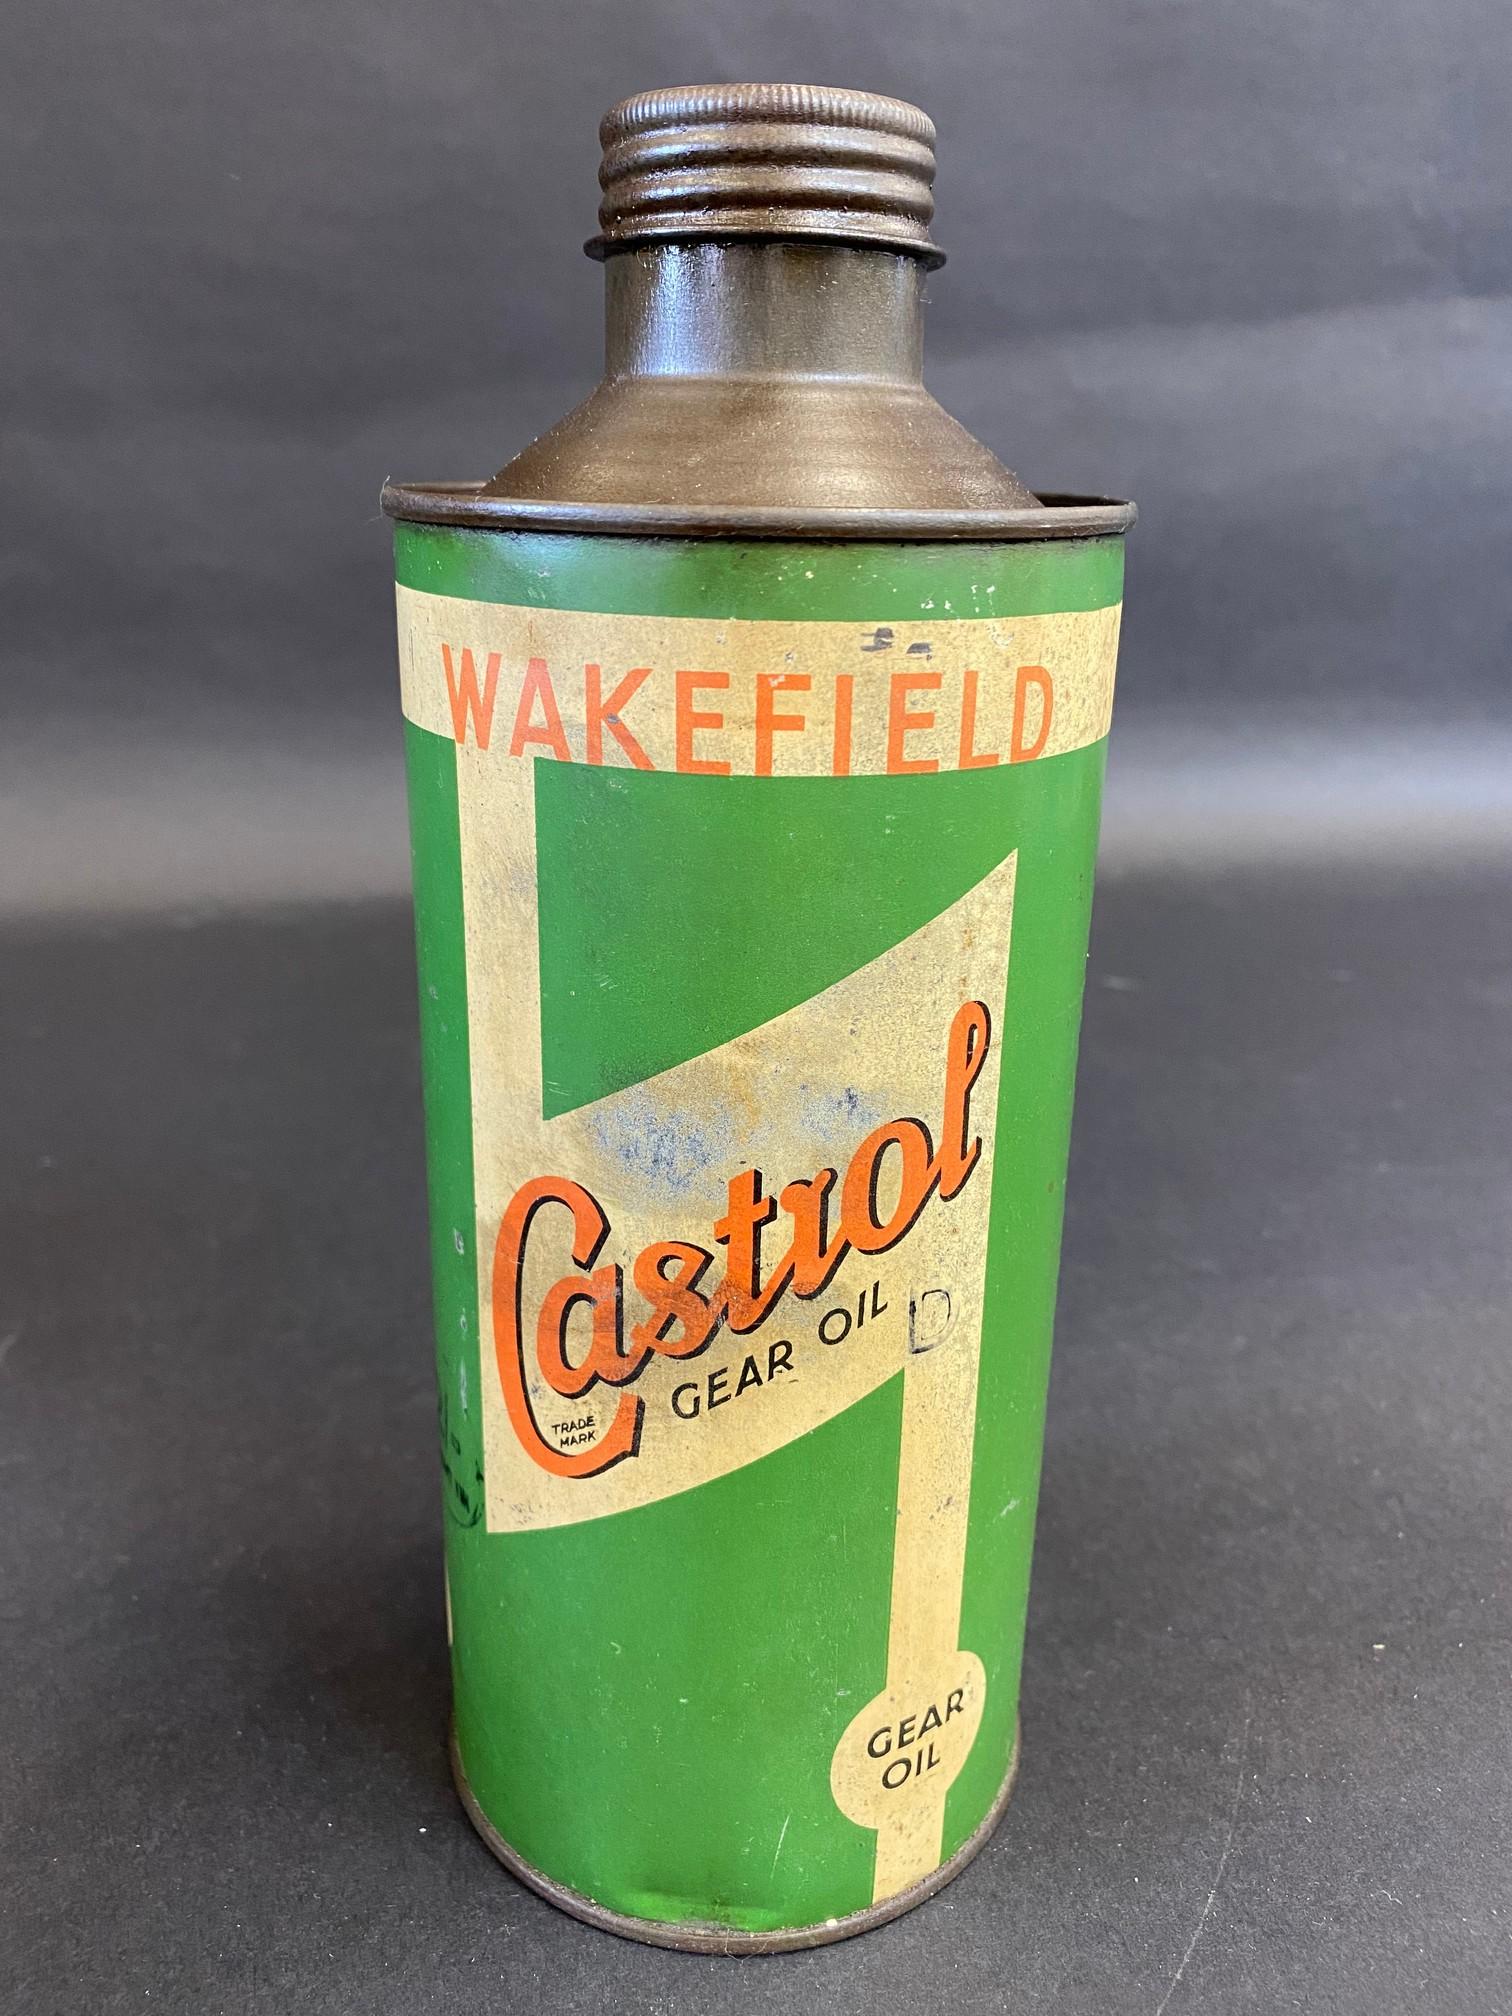 A Wakefield Castrol Gear Oil cylindrical quart can.